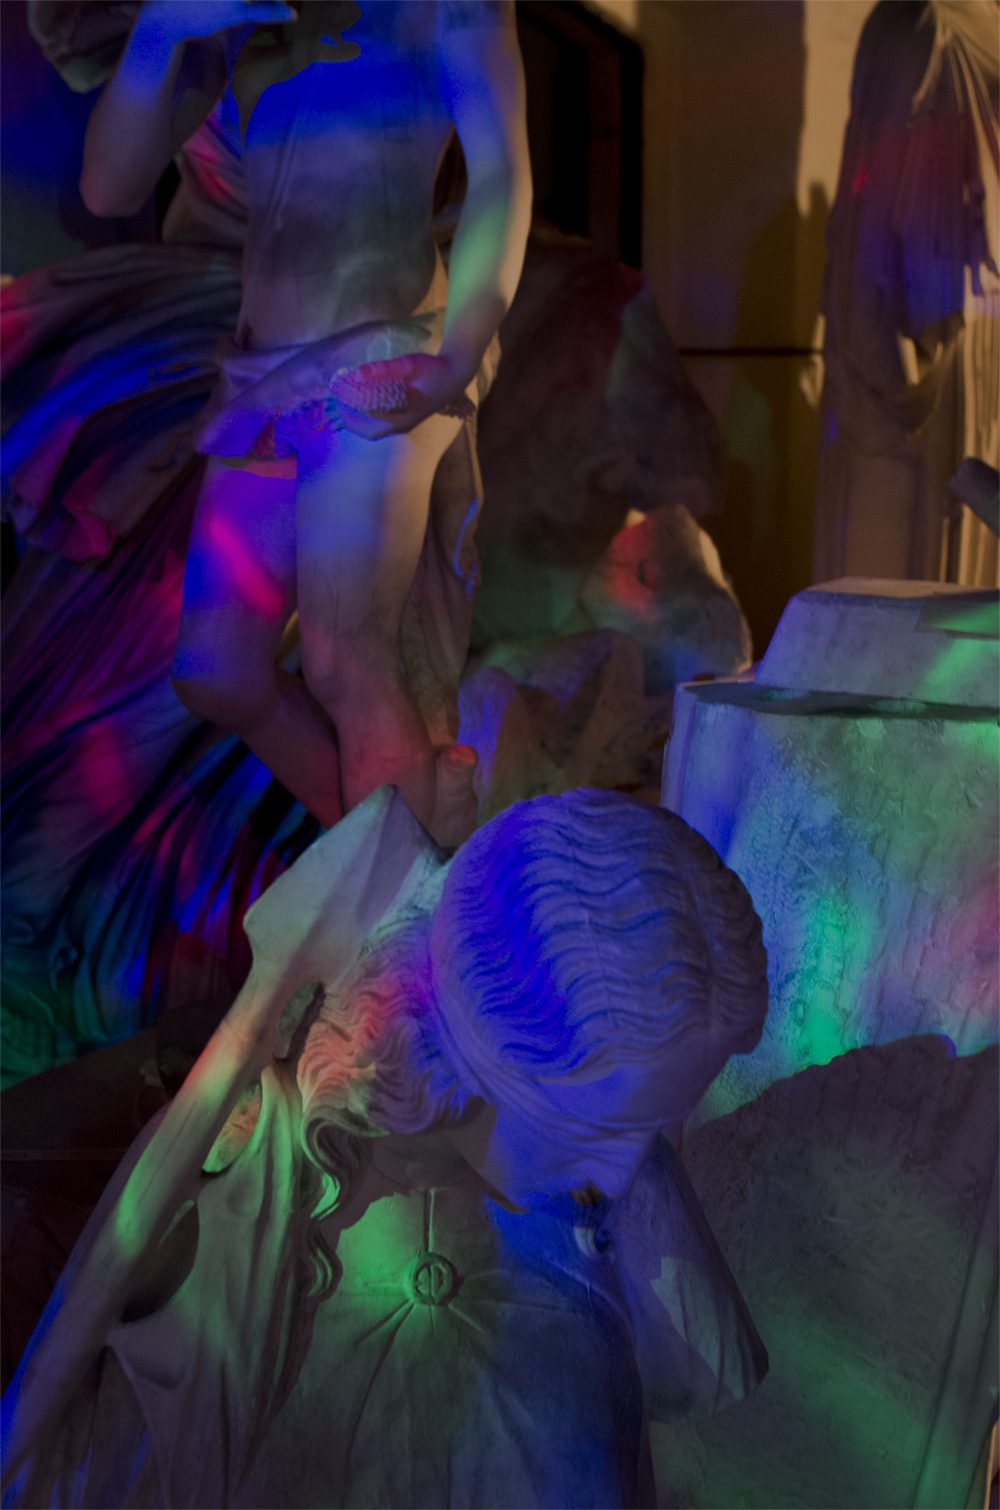 Adam Fenton, Sketch For The Ultimate New Aestetic Dancefloor Of The Future 2.0. Foto: Alma Ulrikke Bille Stræde.